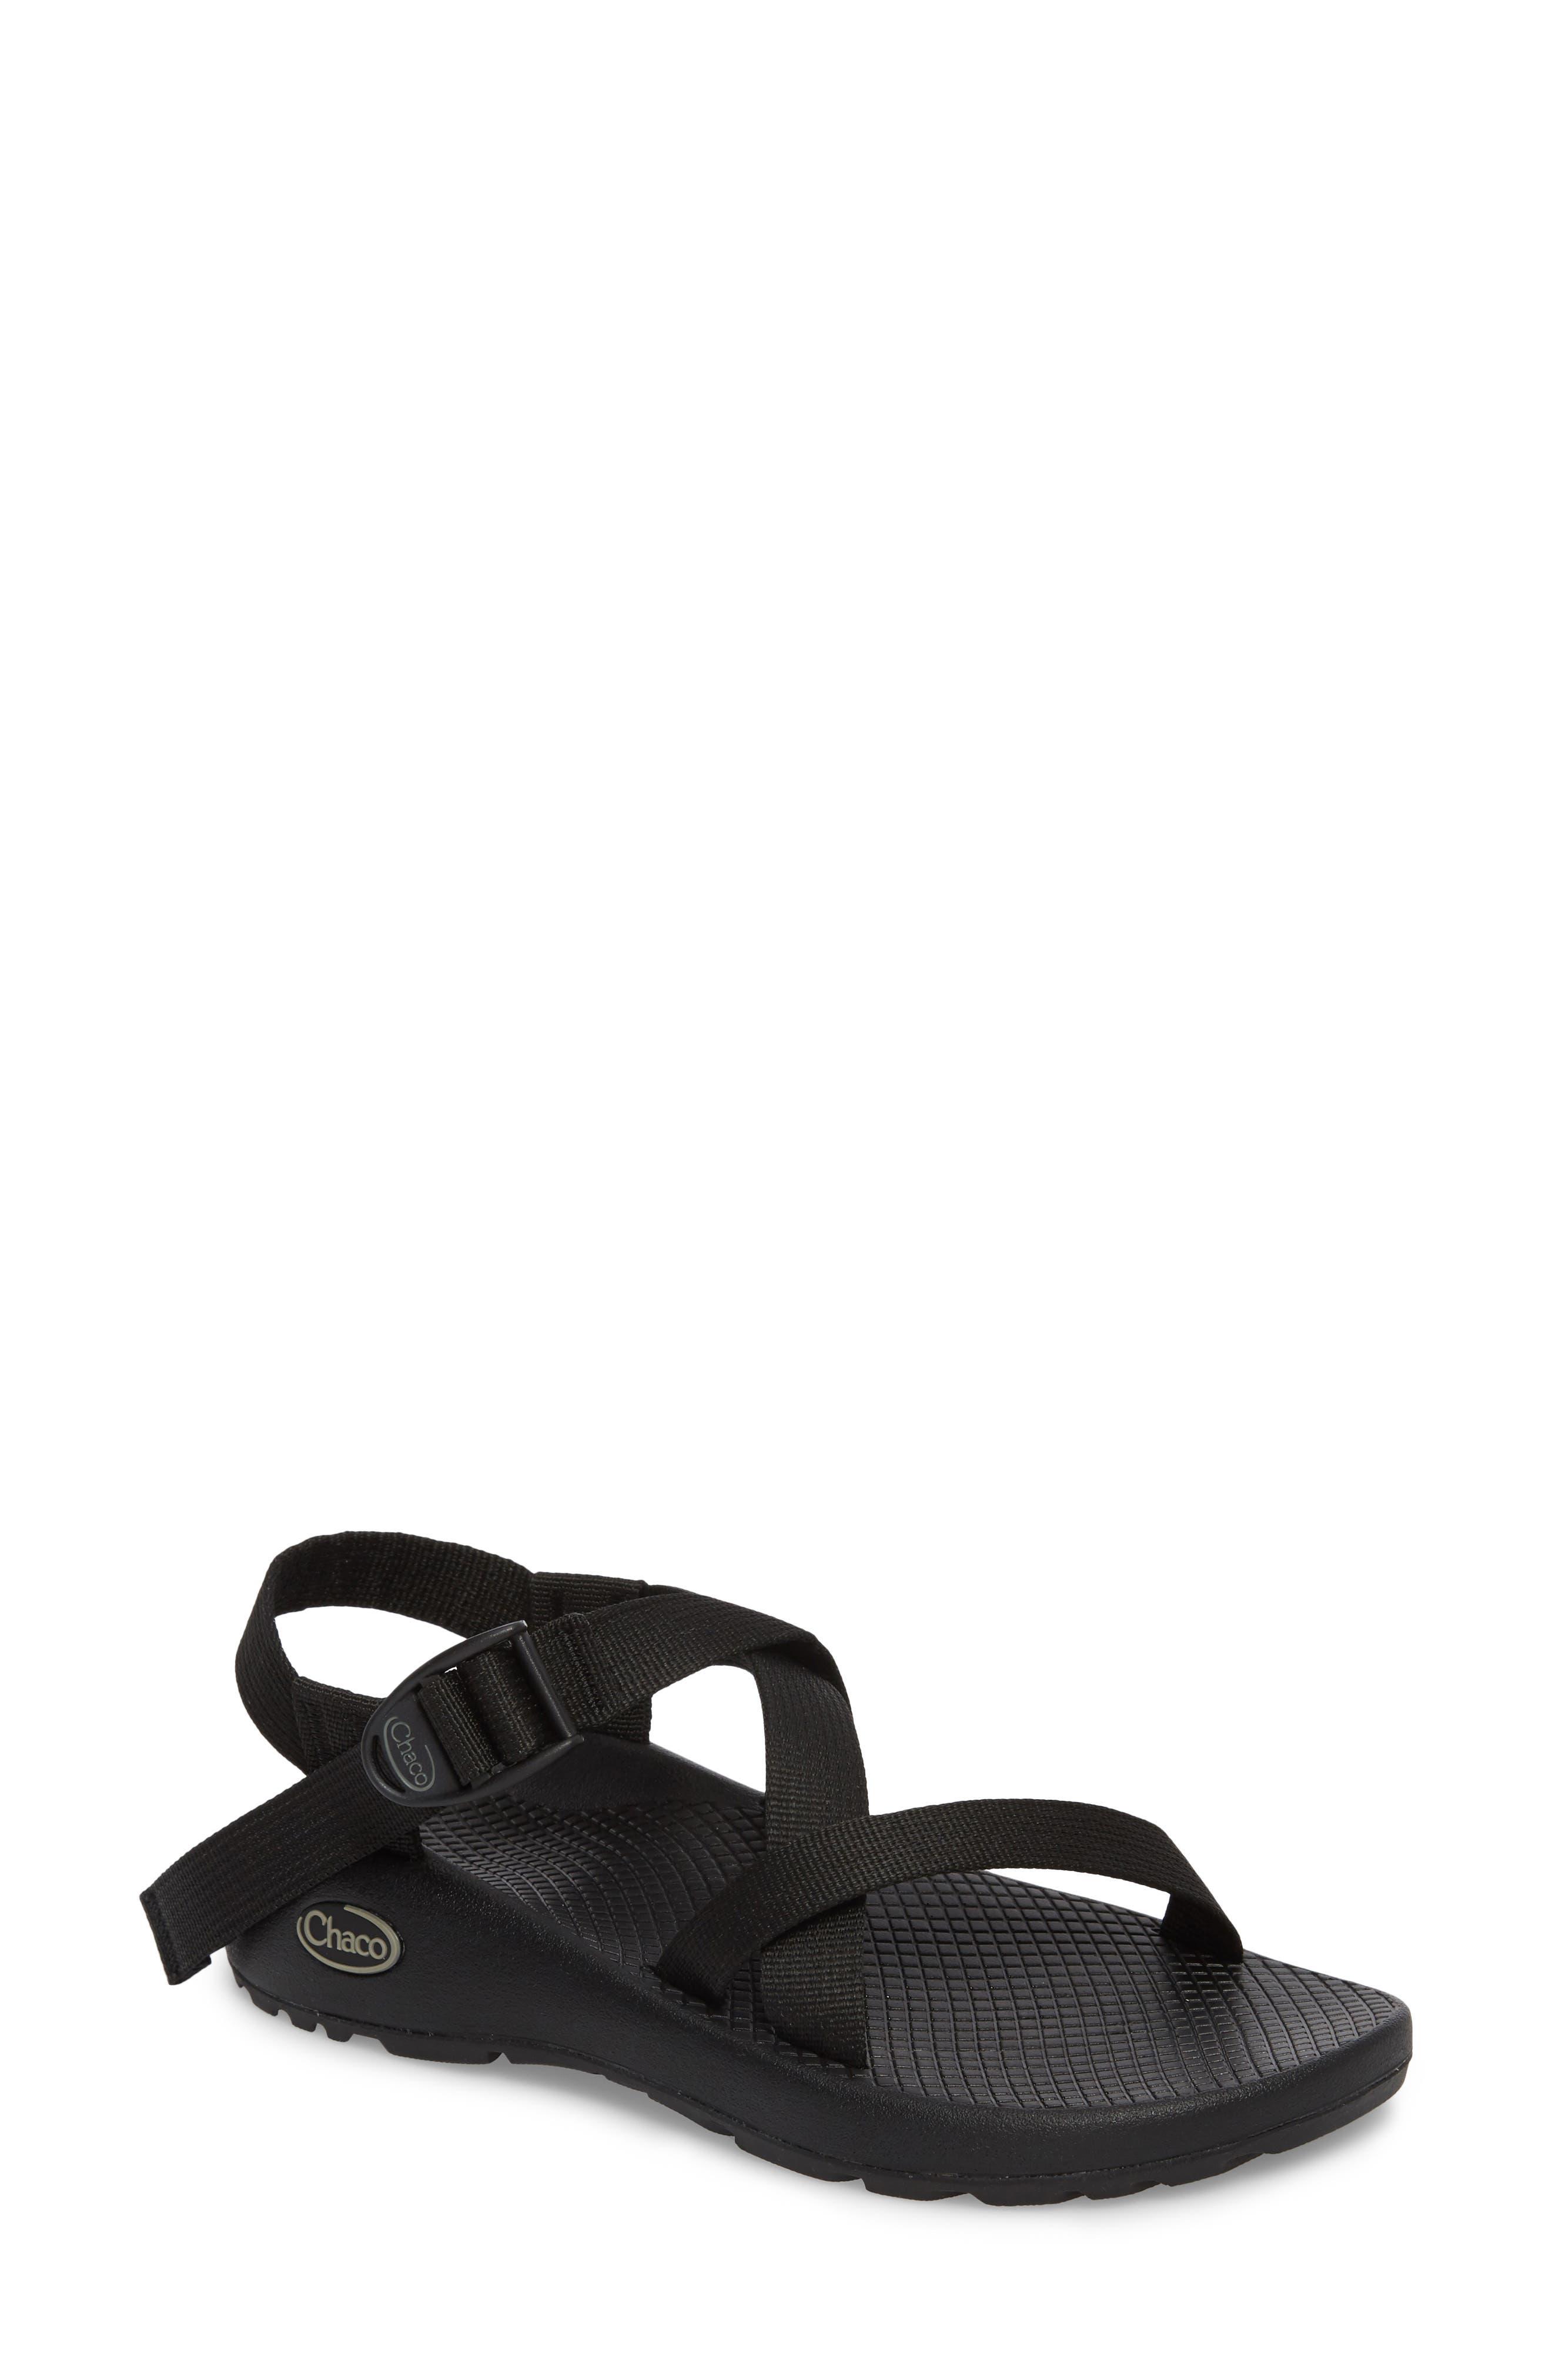 Z/1 Classic Sport Sandal